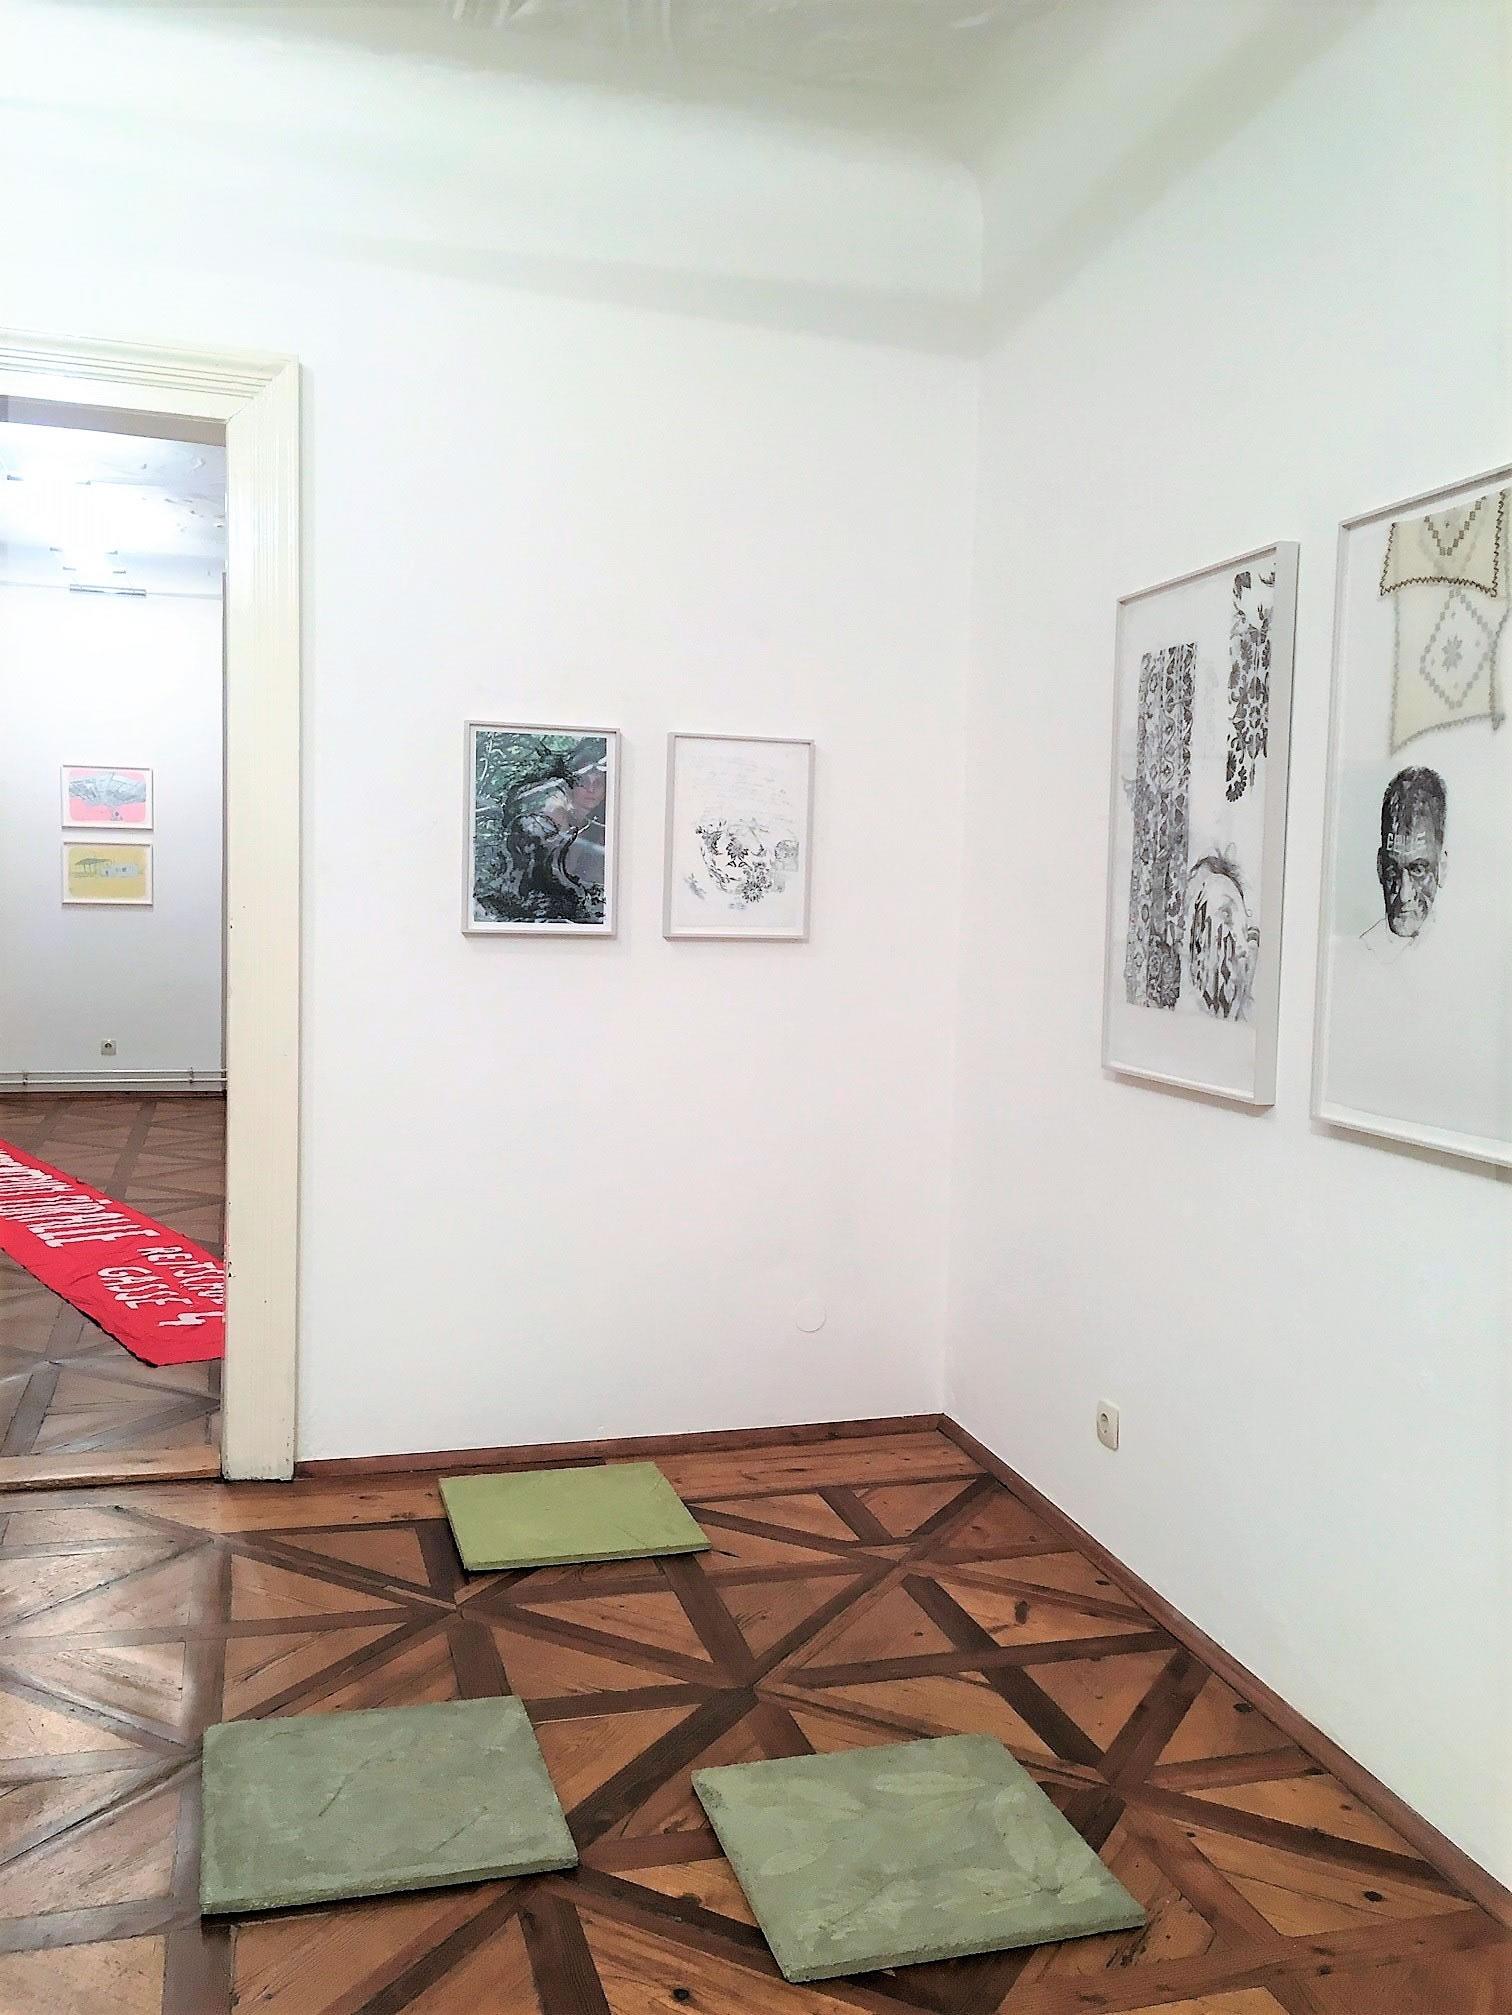 Iris Adraschek | Hubert Lobnig | Raum 2